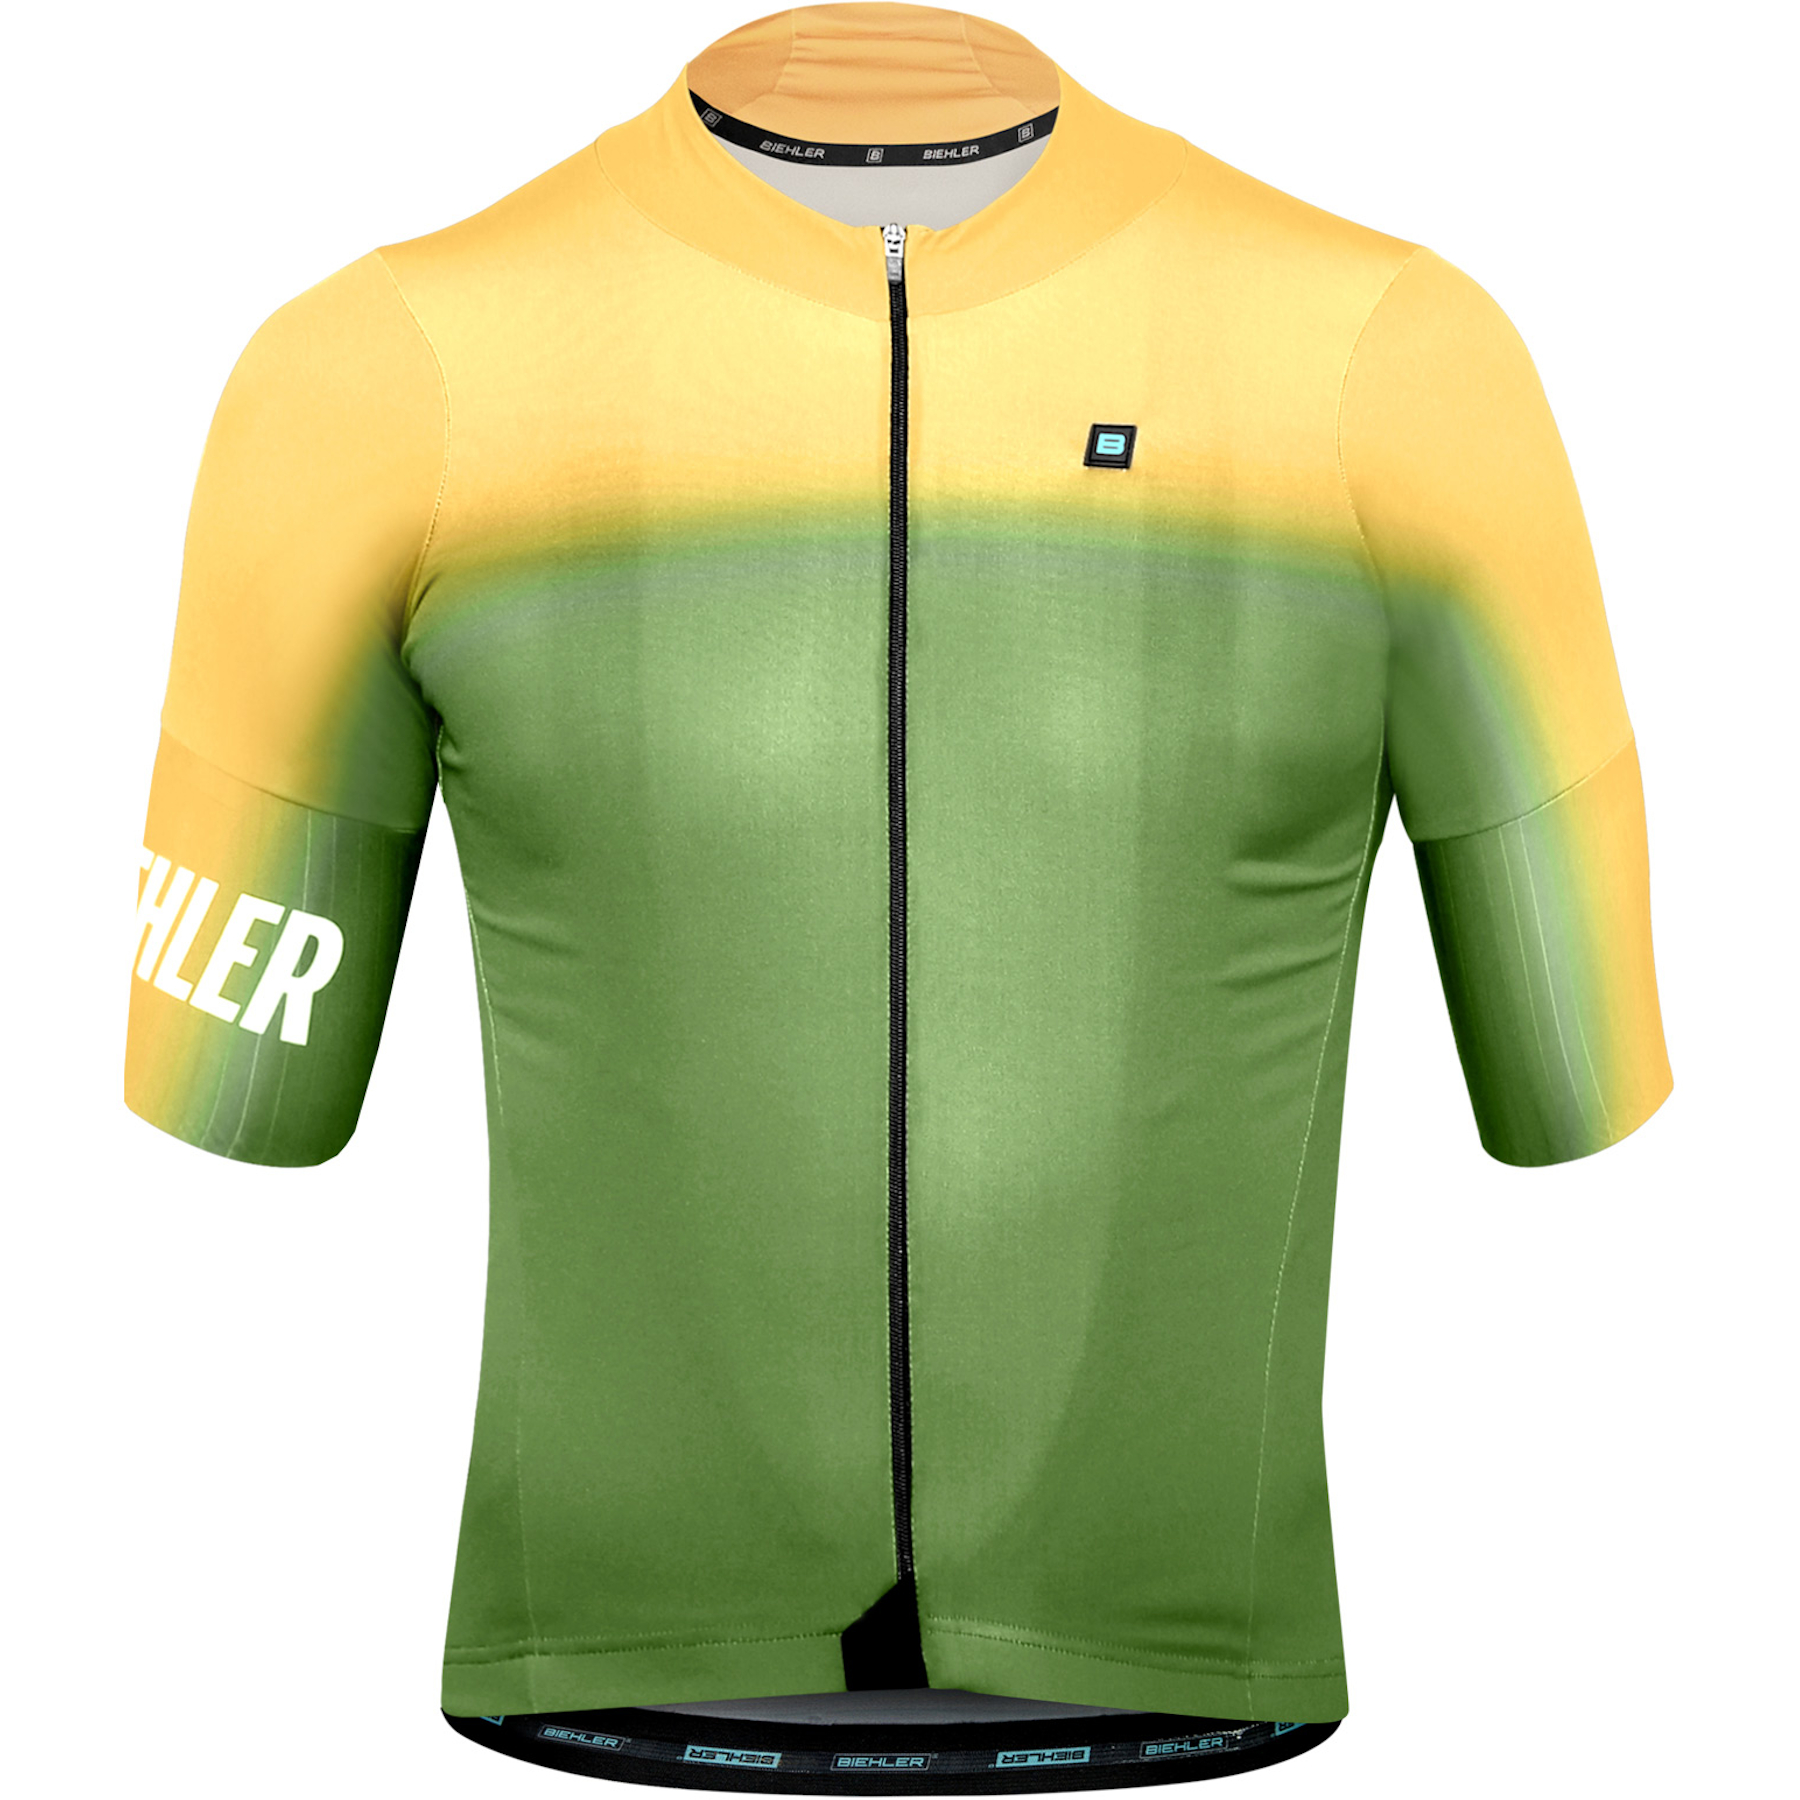 Biehler Men Essential Cycling Jersey - mild yellow